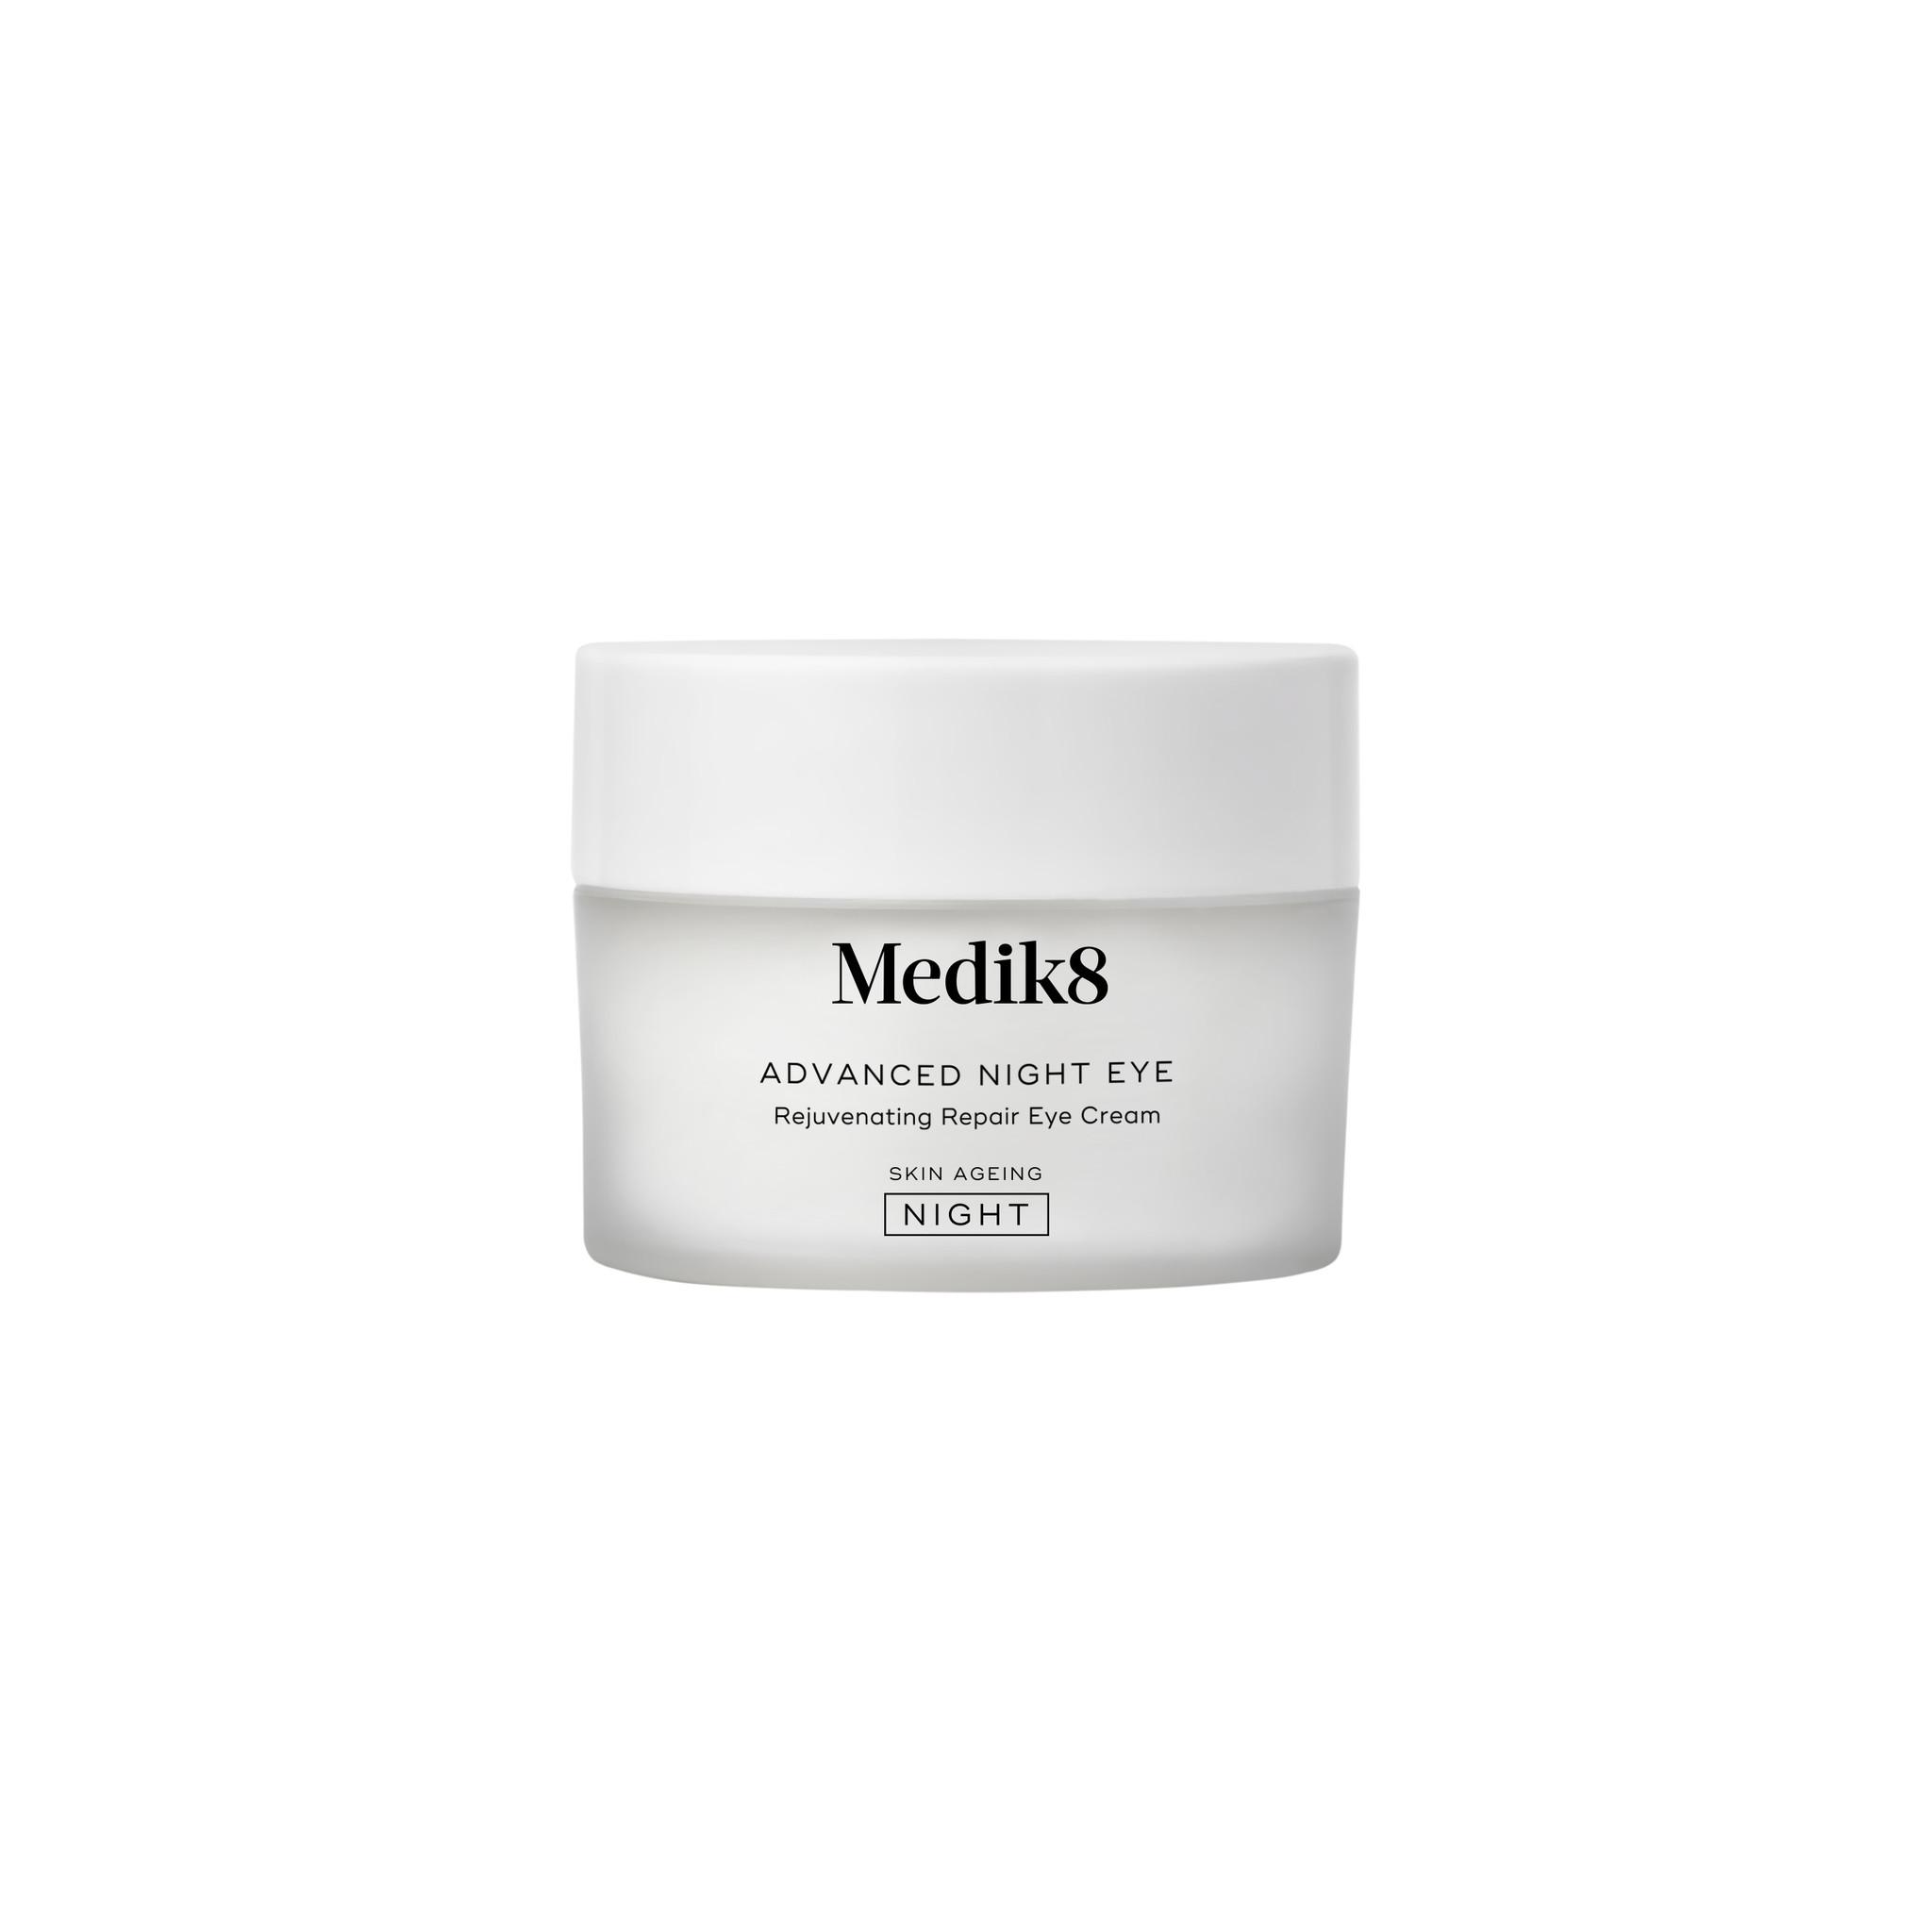 Medik8 Advanced Night Eye | Rejuvenating Repair Eye Cream